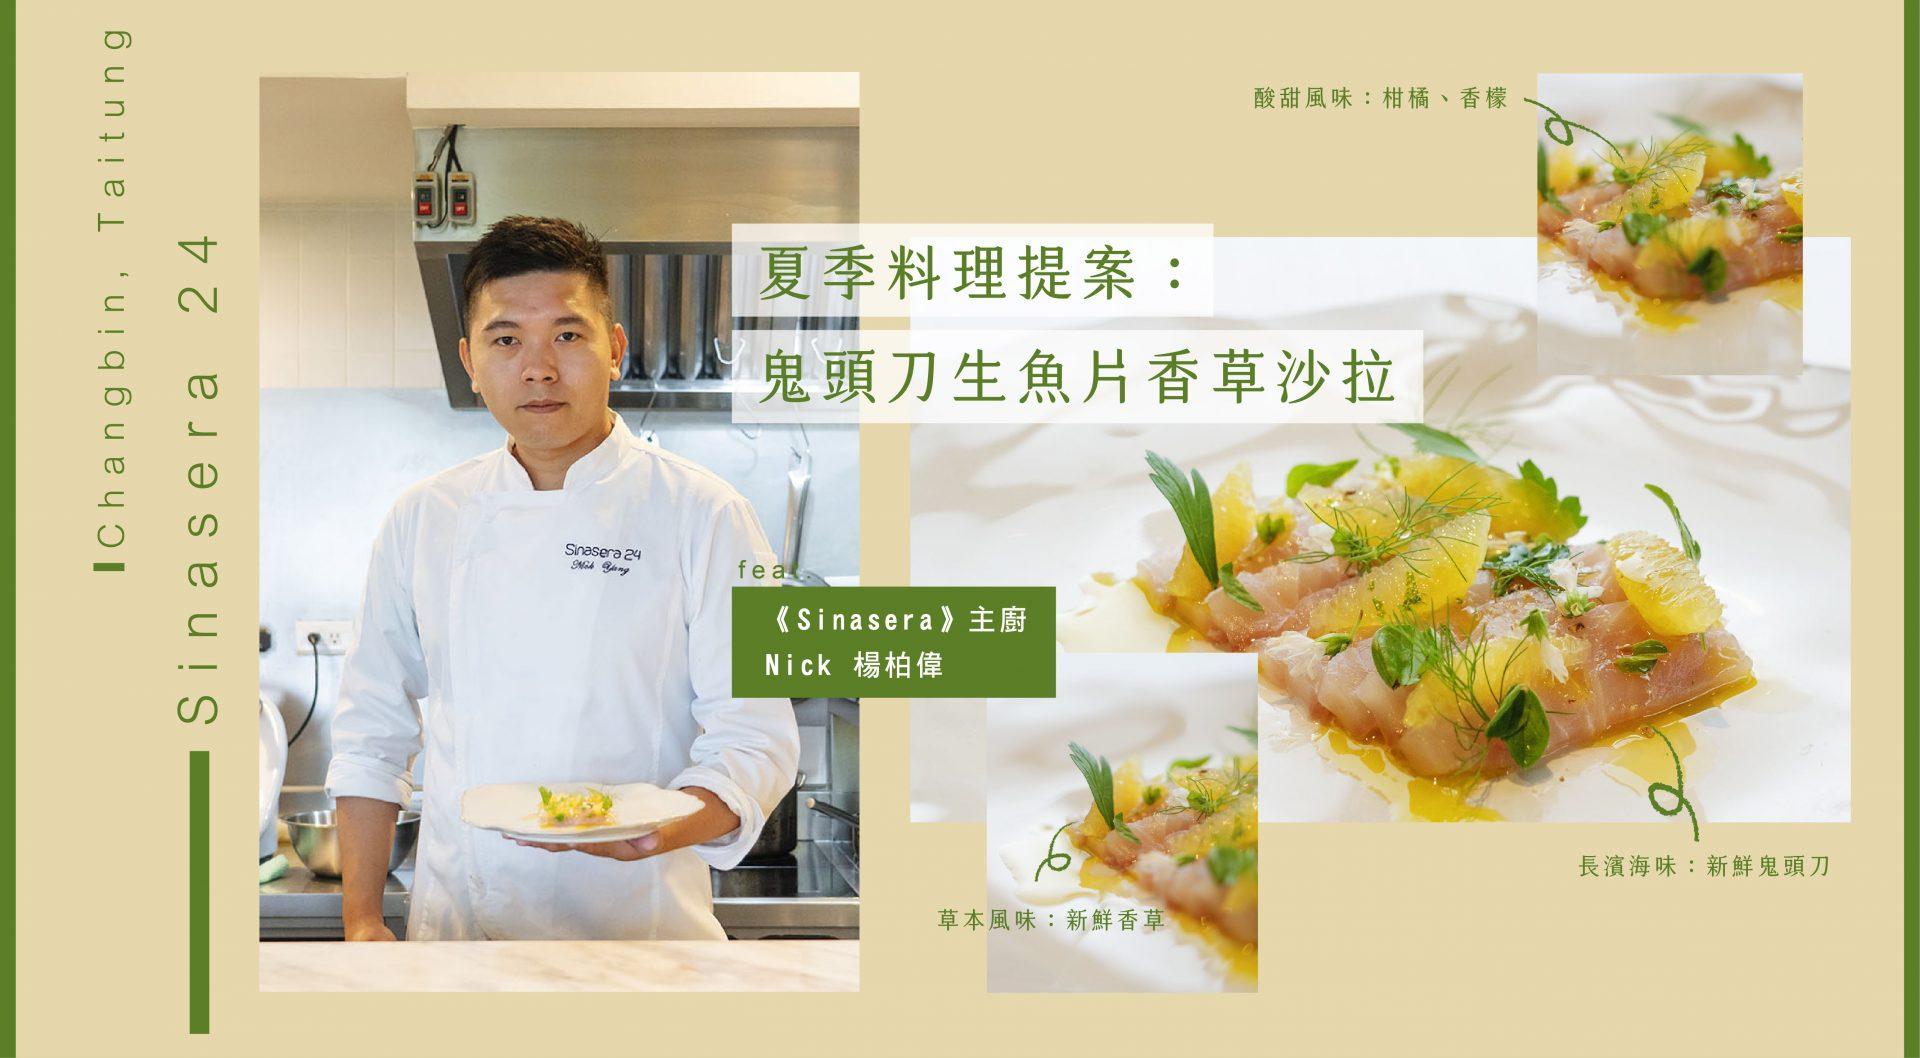 《 Sinasera 24 》主廚楊柏偉的「 夏季料理 」提案:鬼頭刀生魚片香草沙拉